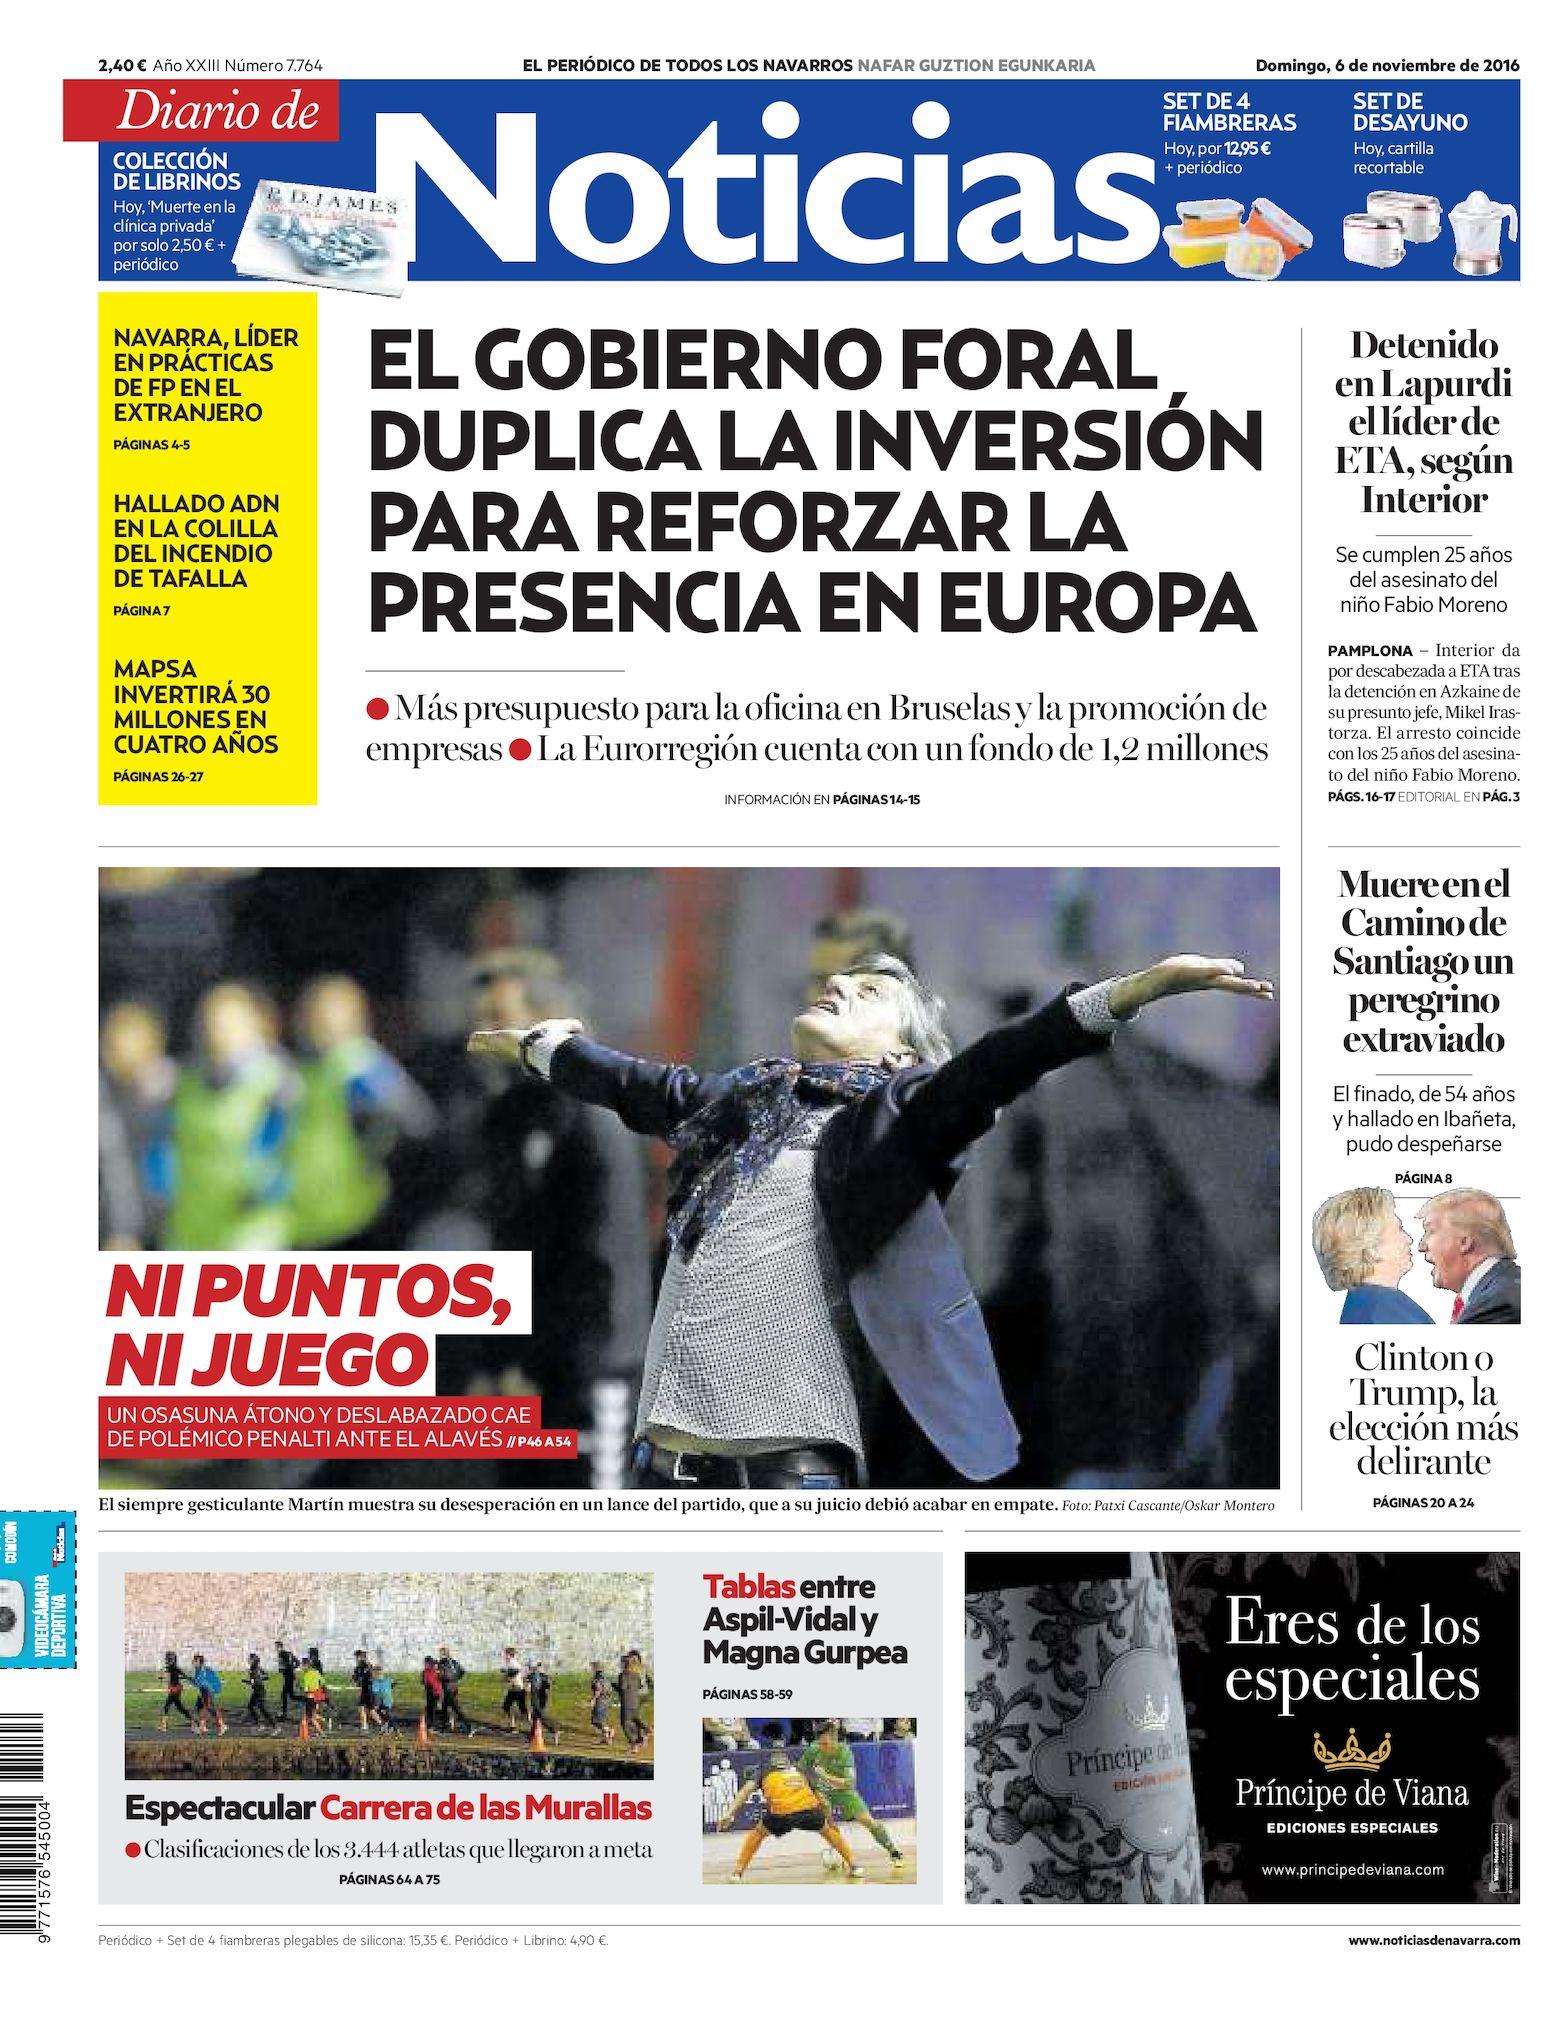 948f203c9 Calaméo - Diario de Noticias 20161106